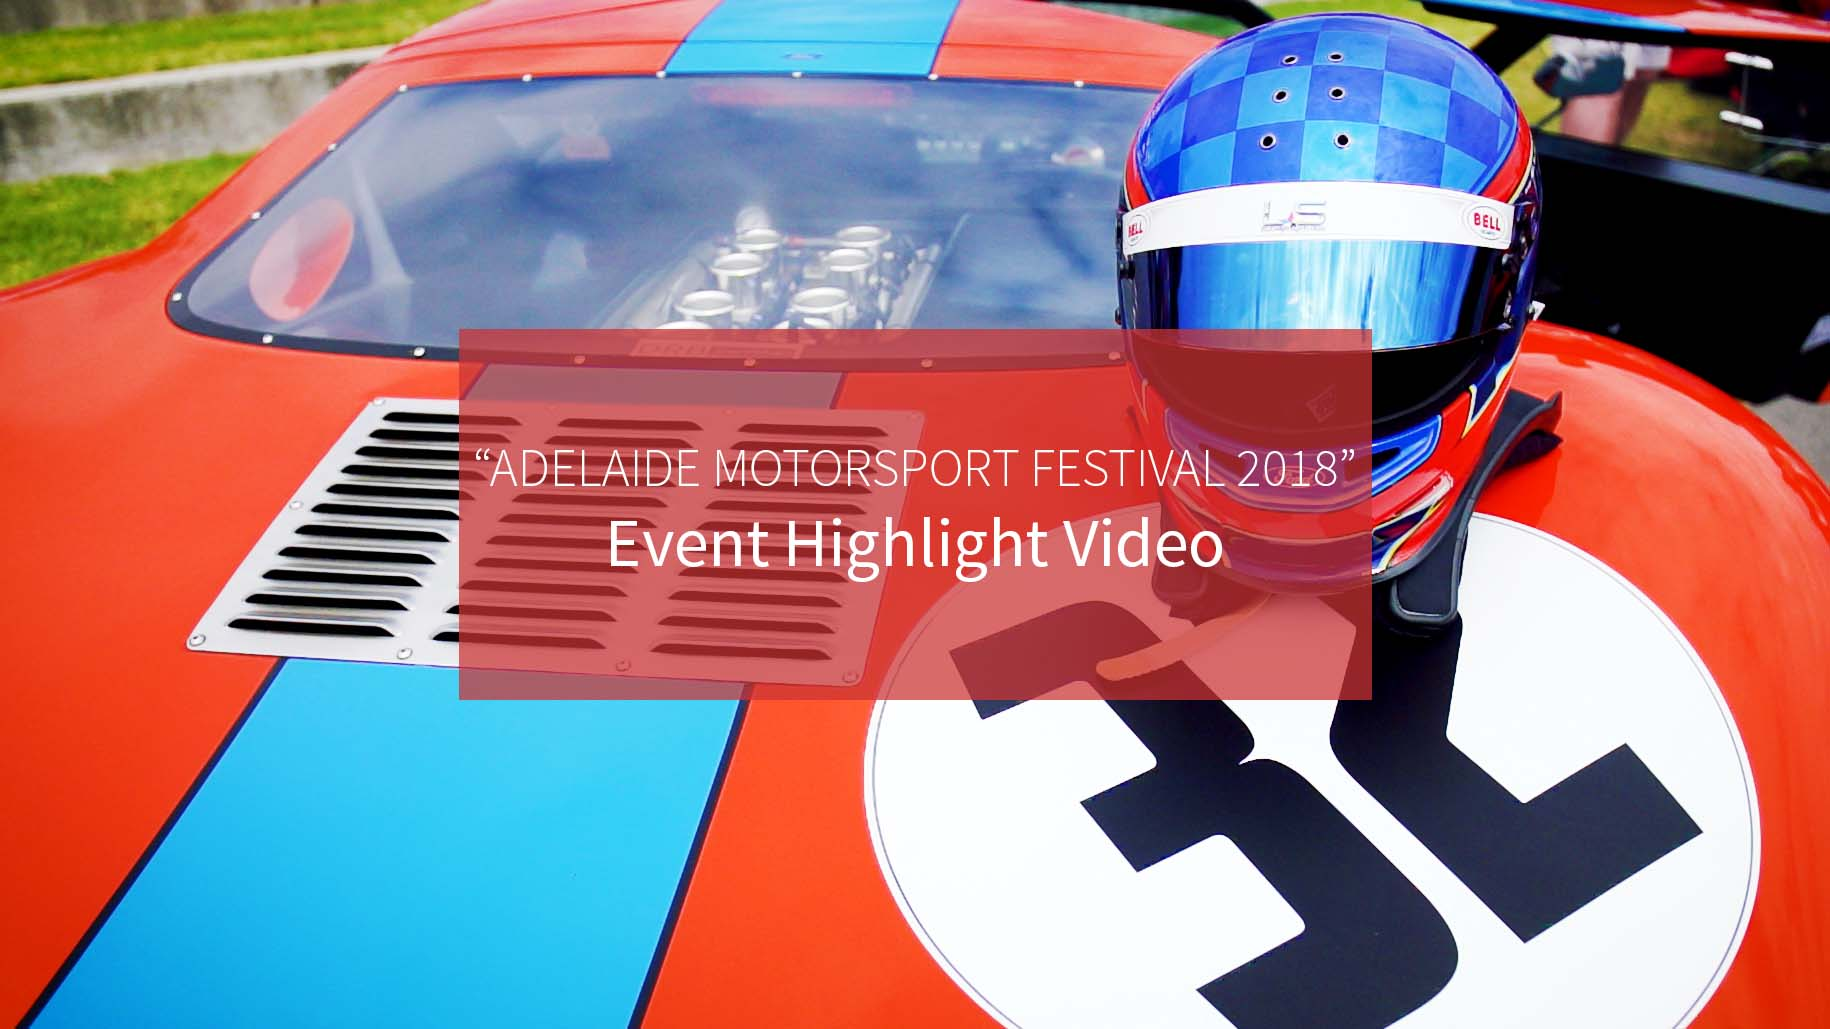 Adelaide Motosport Festival 2018 Event highlight video image